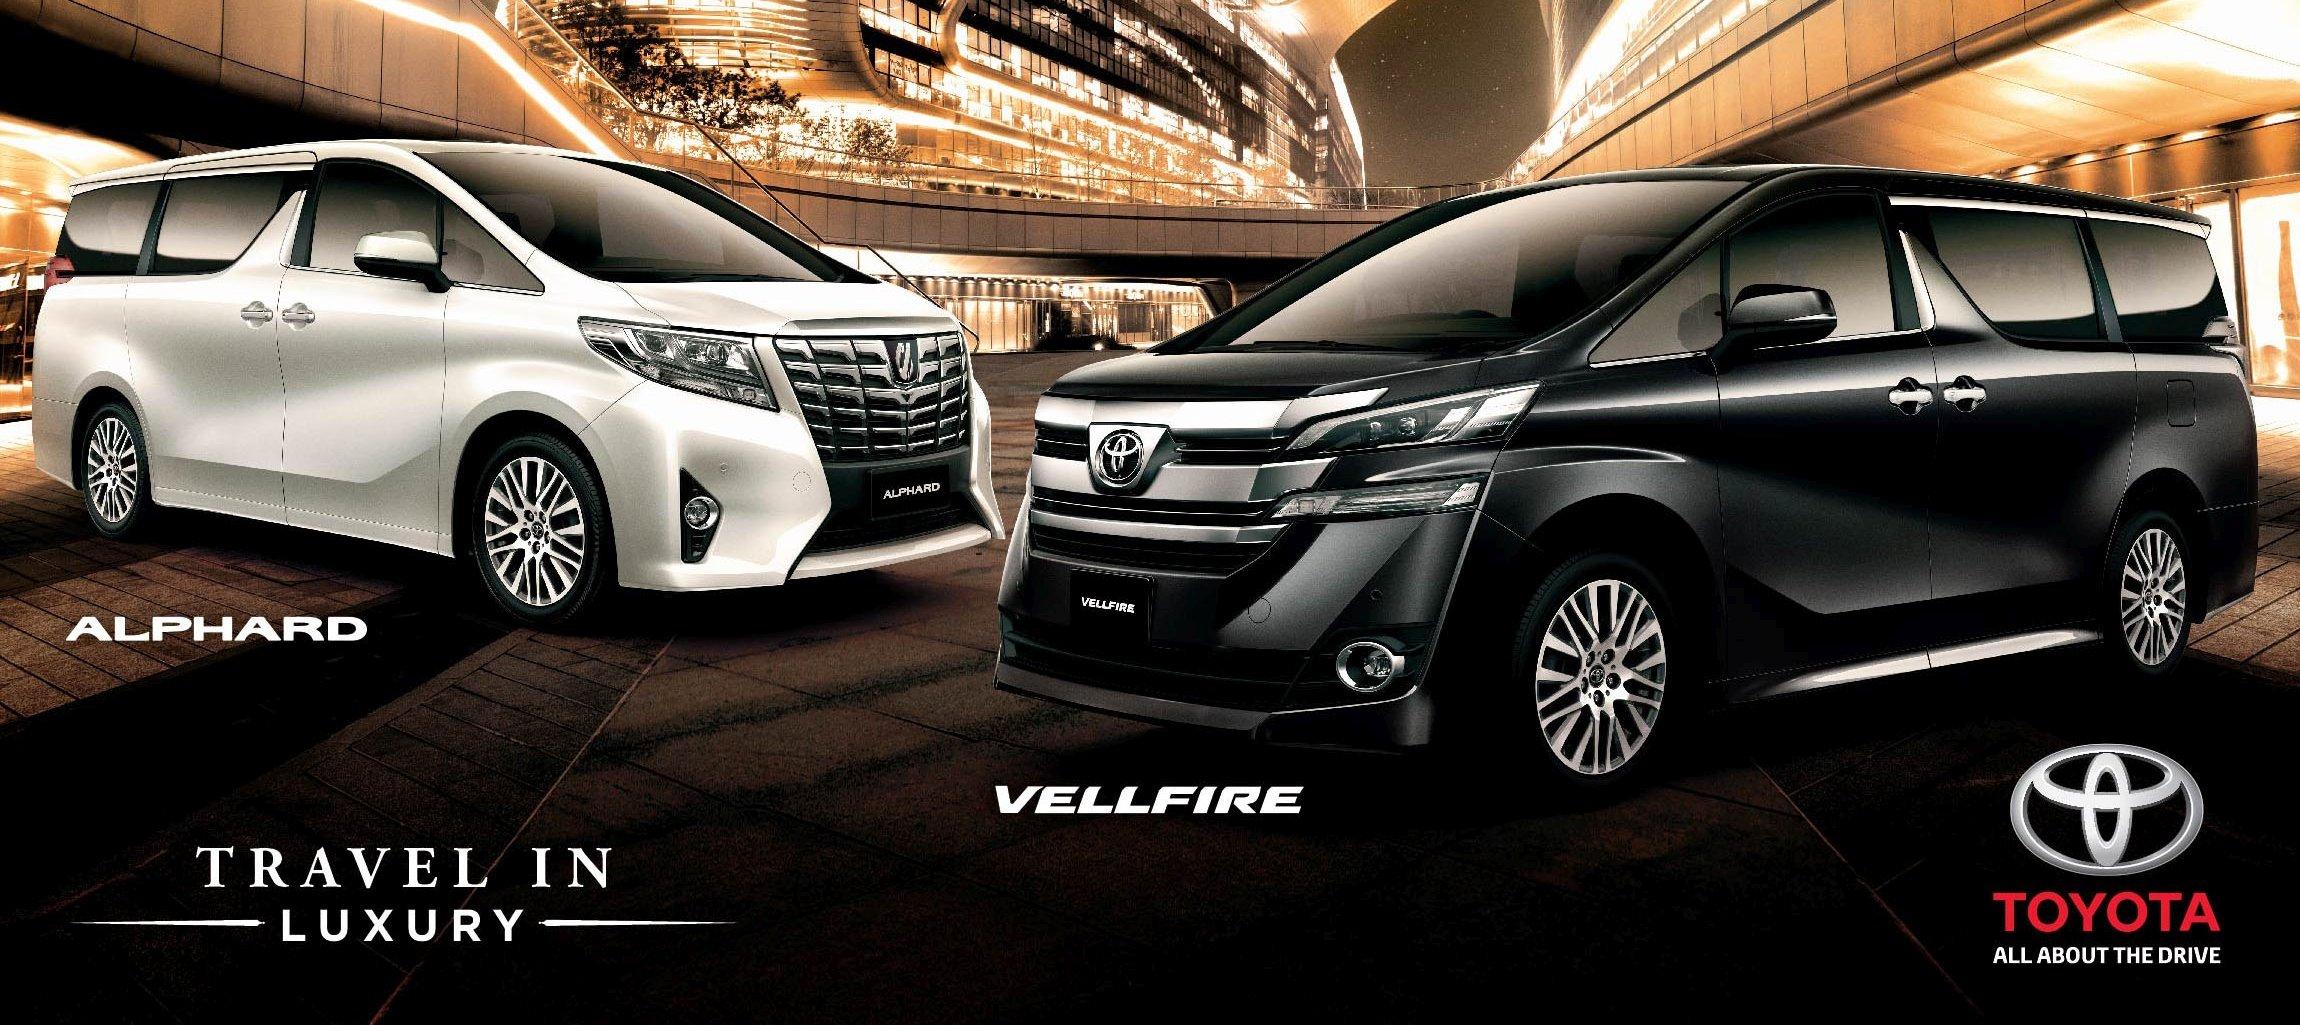 2016 toyota alphard and vellfire prices revealed   rm420k